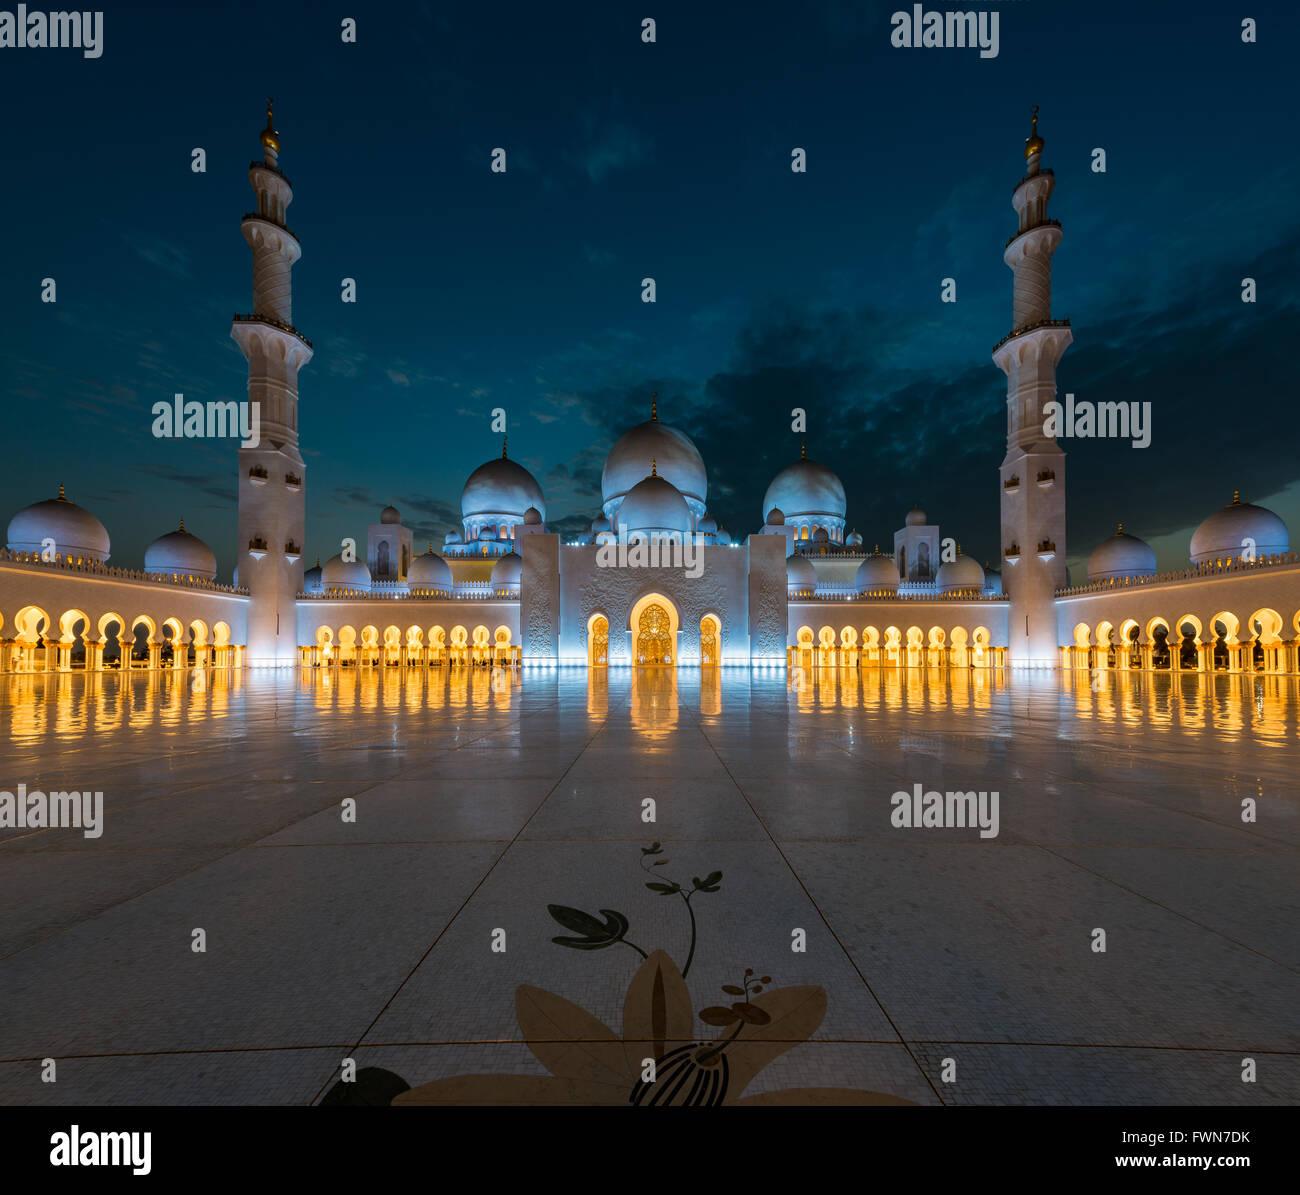 Equivalence - Sheikh Zayed Grand Mosque, Abu Dhabi - Stock Image